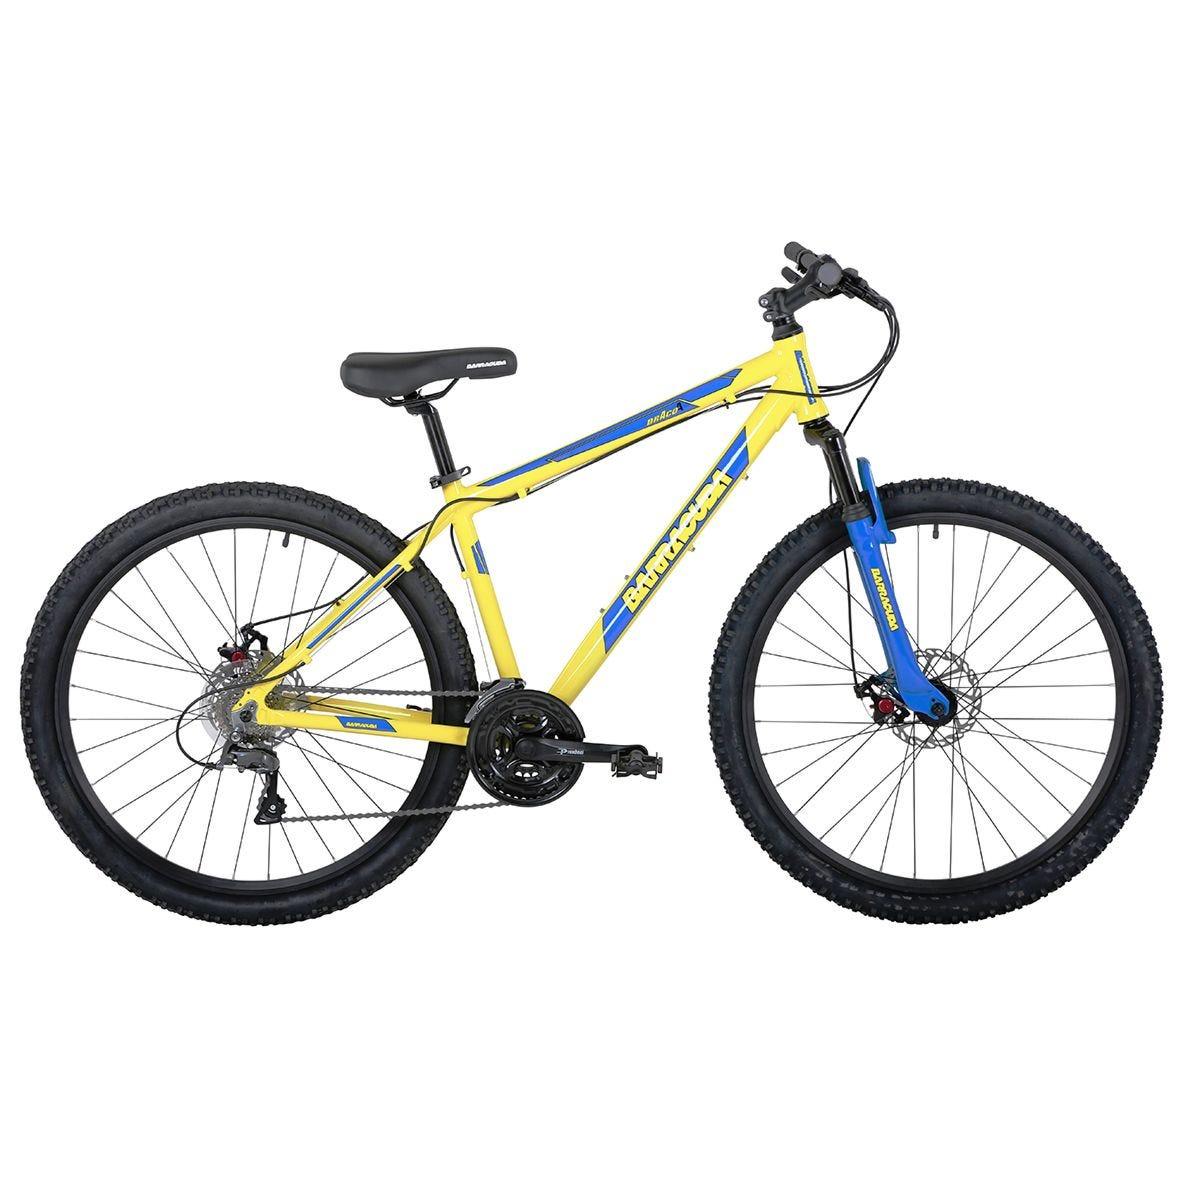 Barracuda Draco 4 17 Inch Frame 27.5 Inch Wheel 24 Speed Disc Brake Mountain Bike - Yellow/Blue